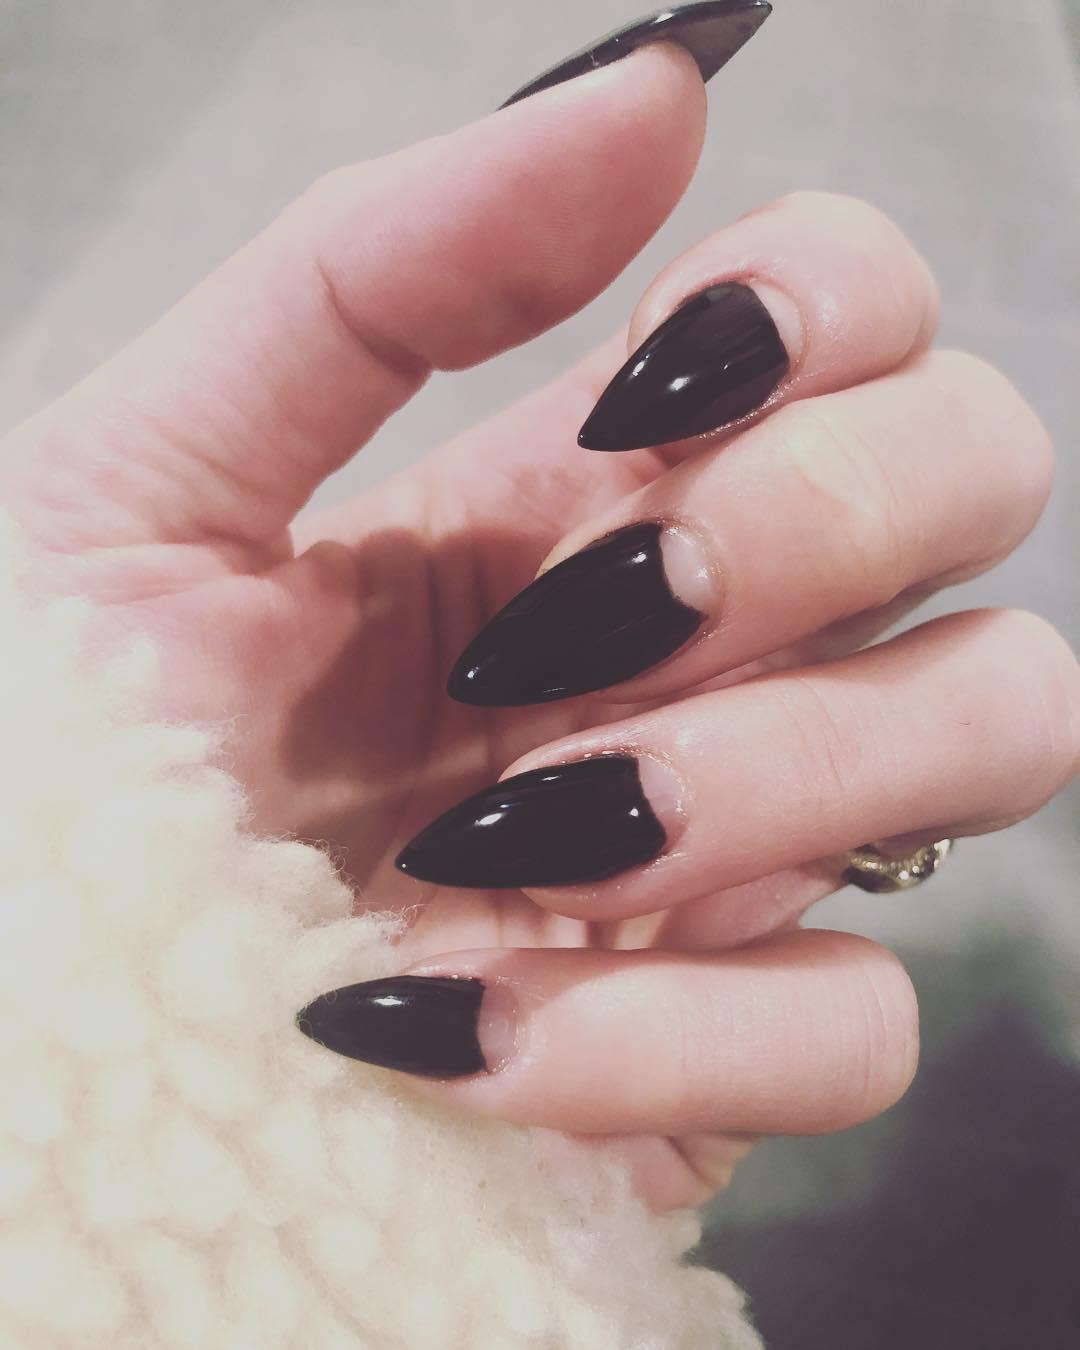 elegant black nail designs 2019 11 - Elegant Black Nail Designs 2019